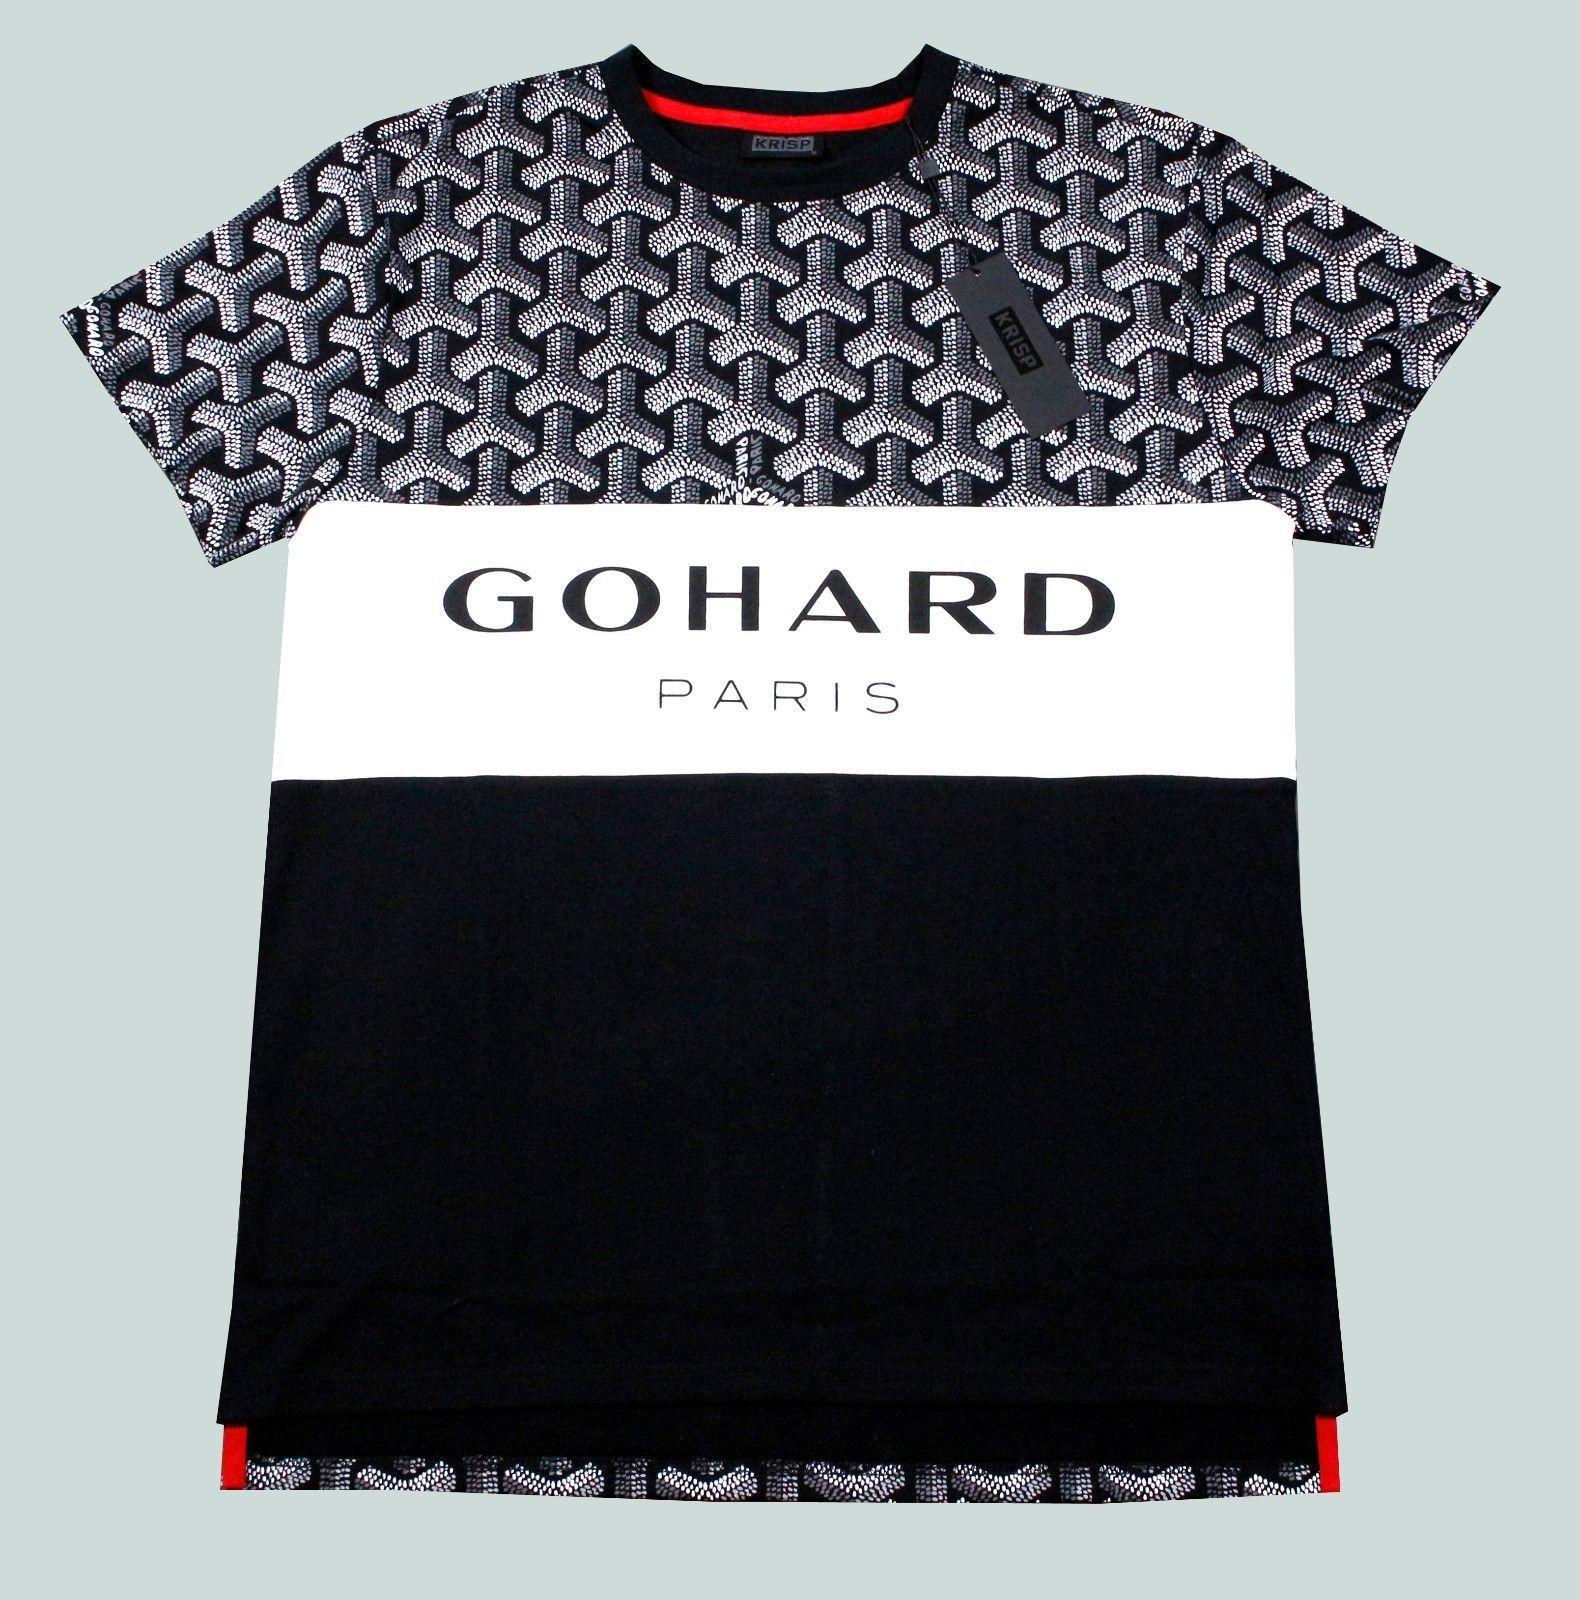 a77291ee8 Men's Go Hard Paris Gucci Parody Goyard Print Tee Shirt M L XL 2X   eBay